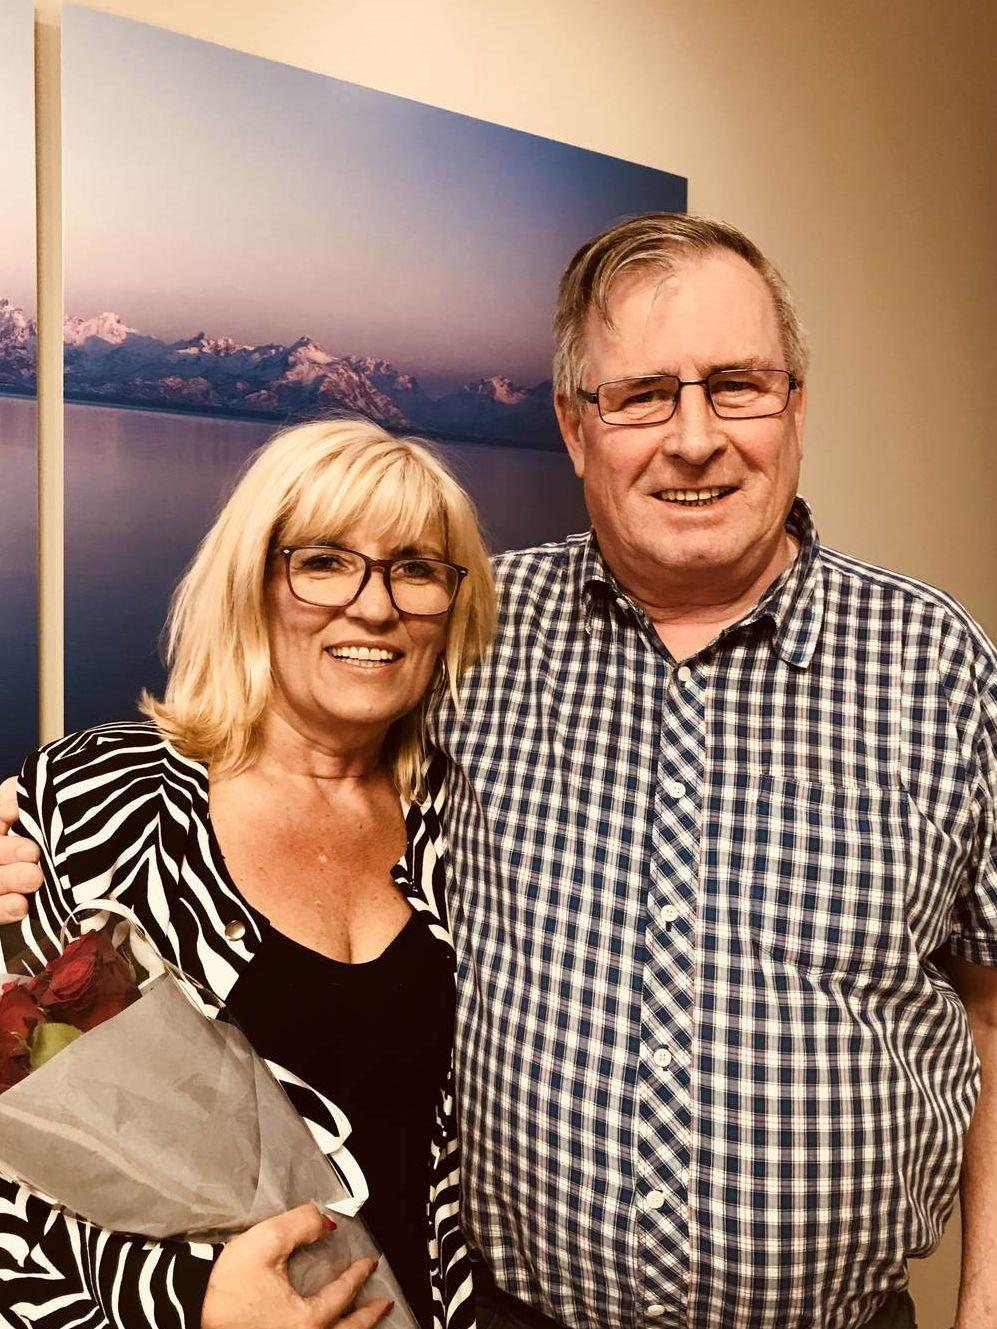 Kari-Anne Opsal og Halvar Hansen